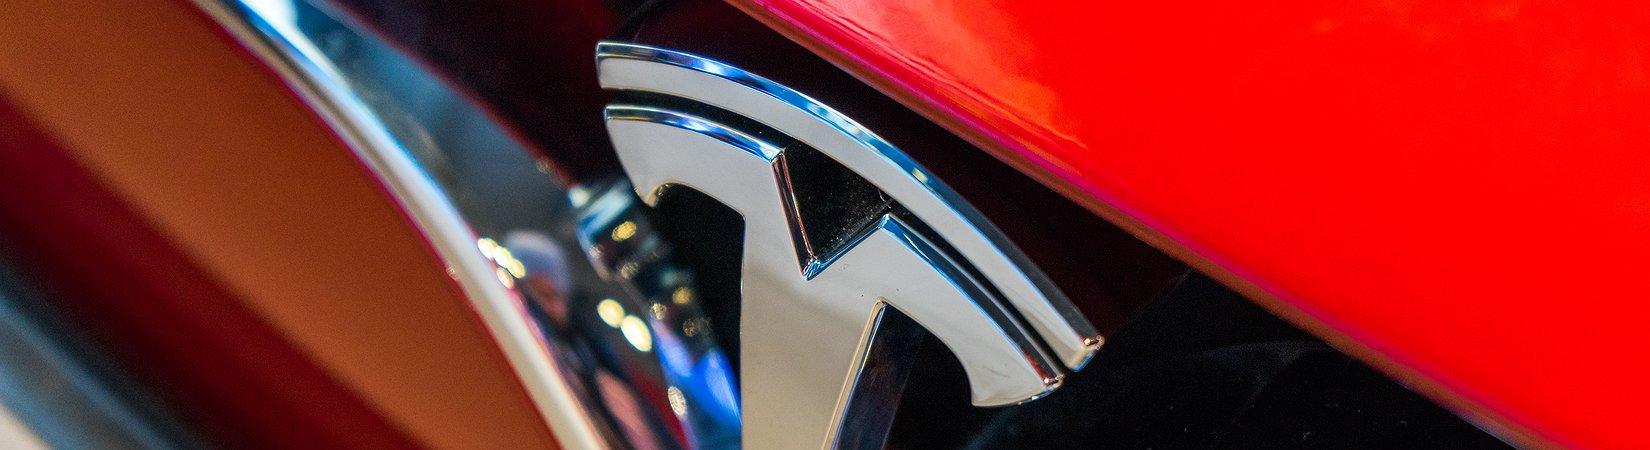 Resultados trimestrais: Tesla superou as expectativas